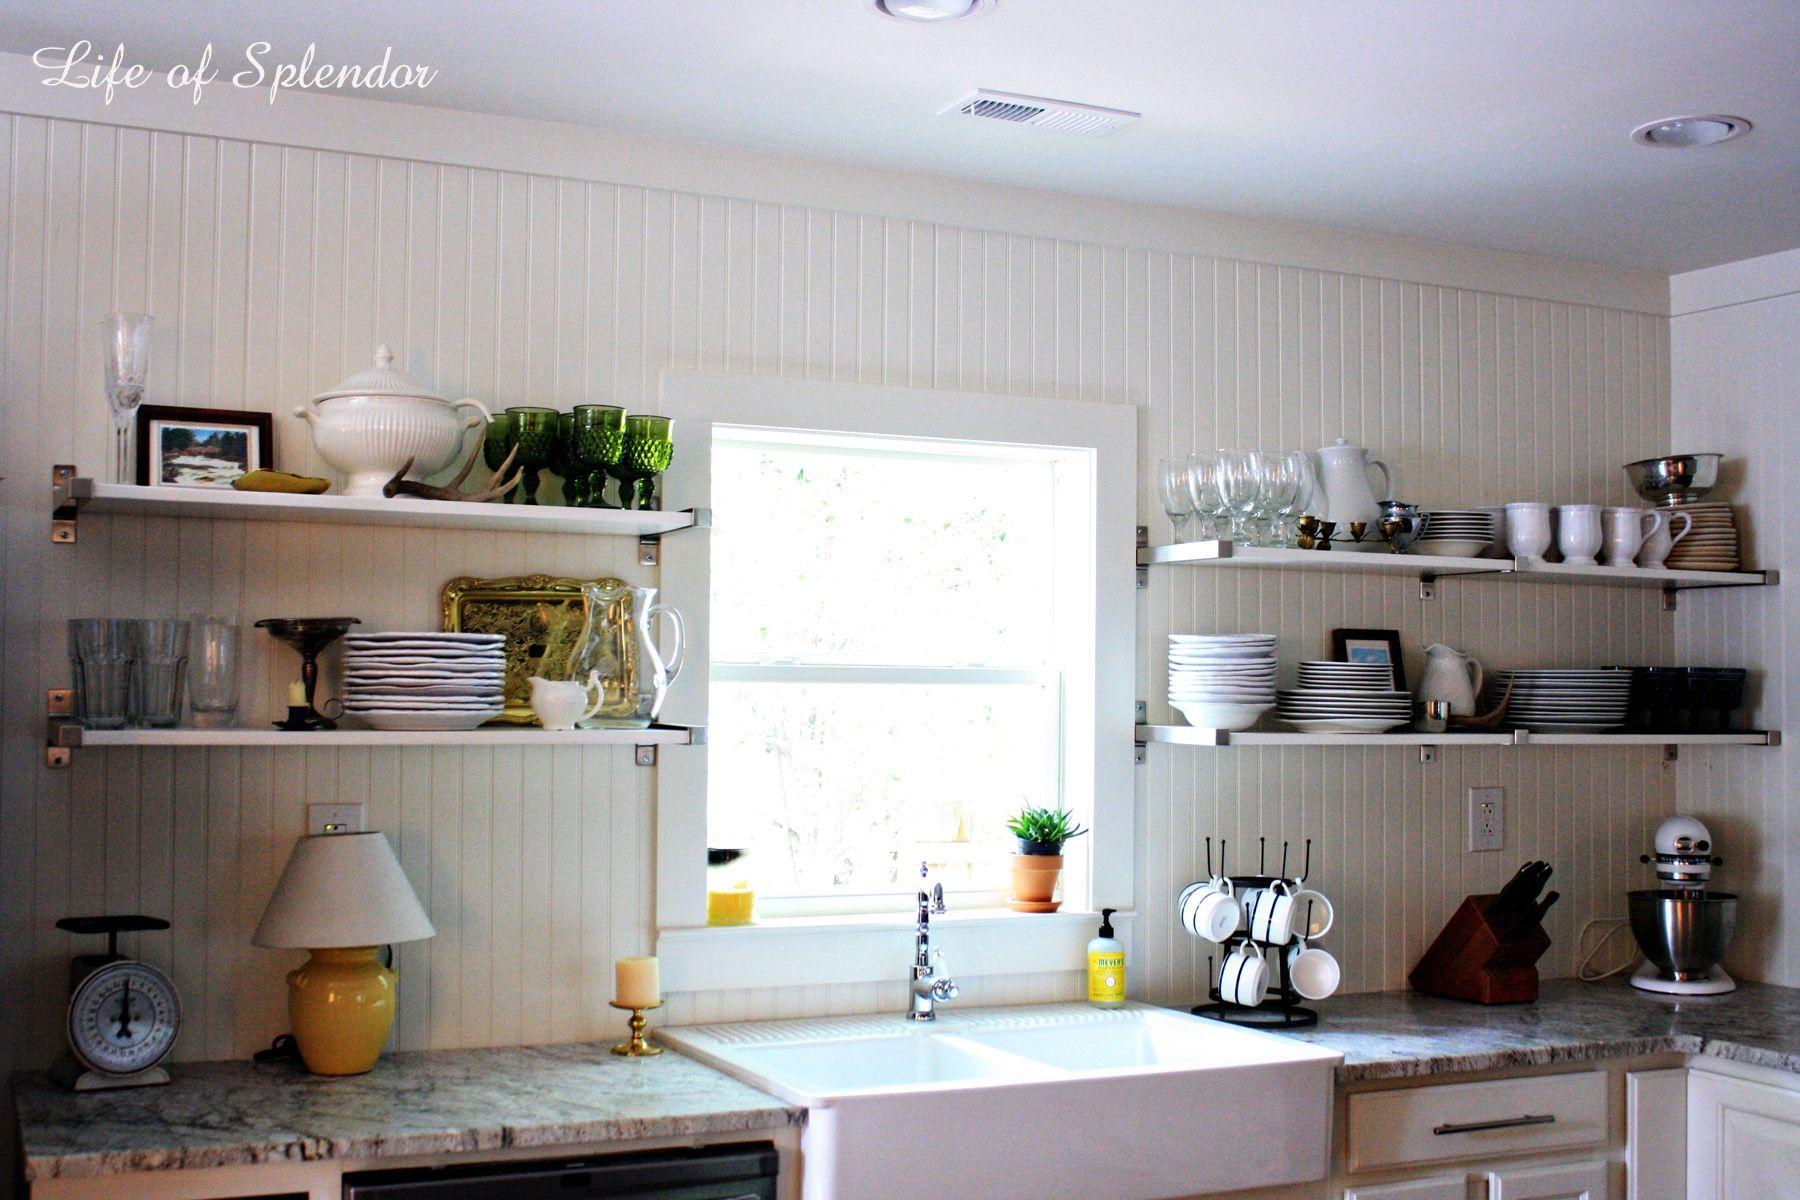 Shelf over kitchen window  kitchen window shelving ideas  navigatorspbfo  pinterest